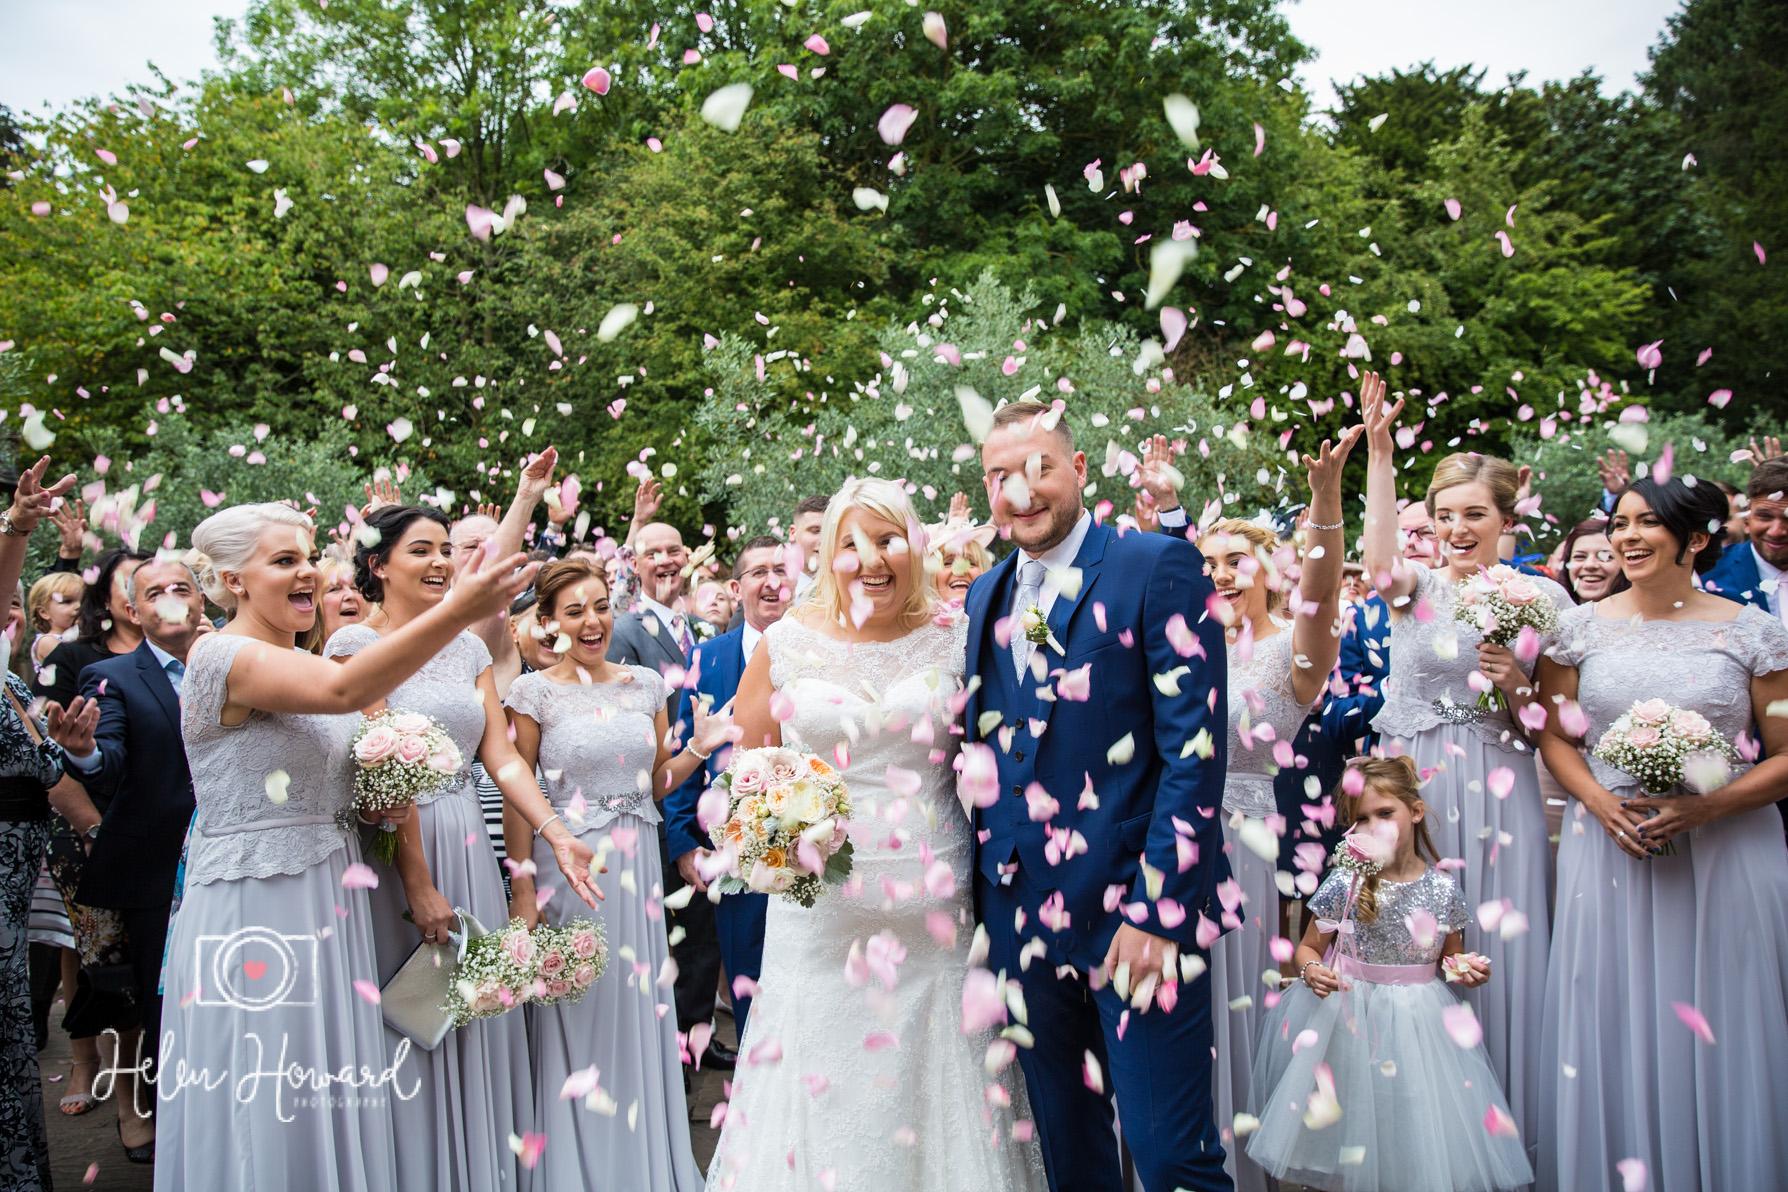 Shustoke Farm Barns Wedding Photography by Helen Howard-23.jpg